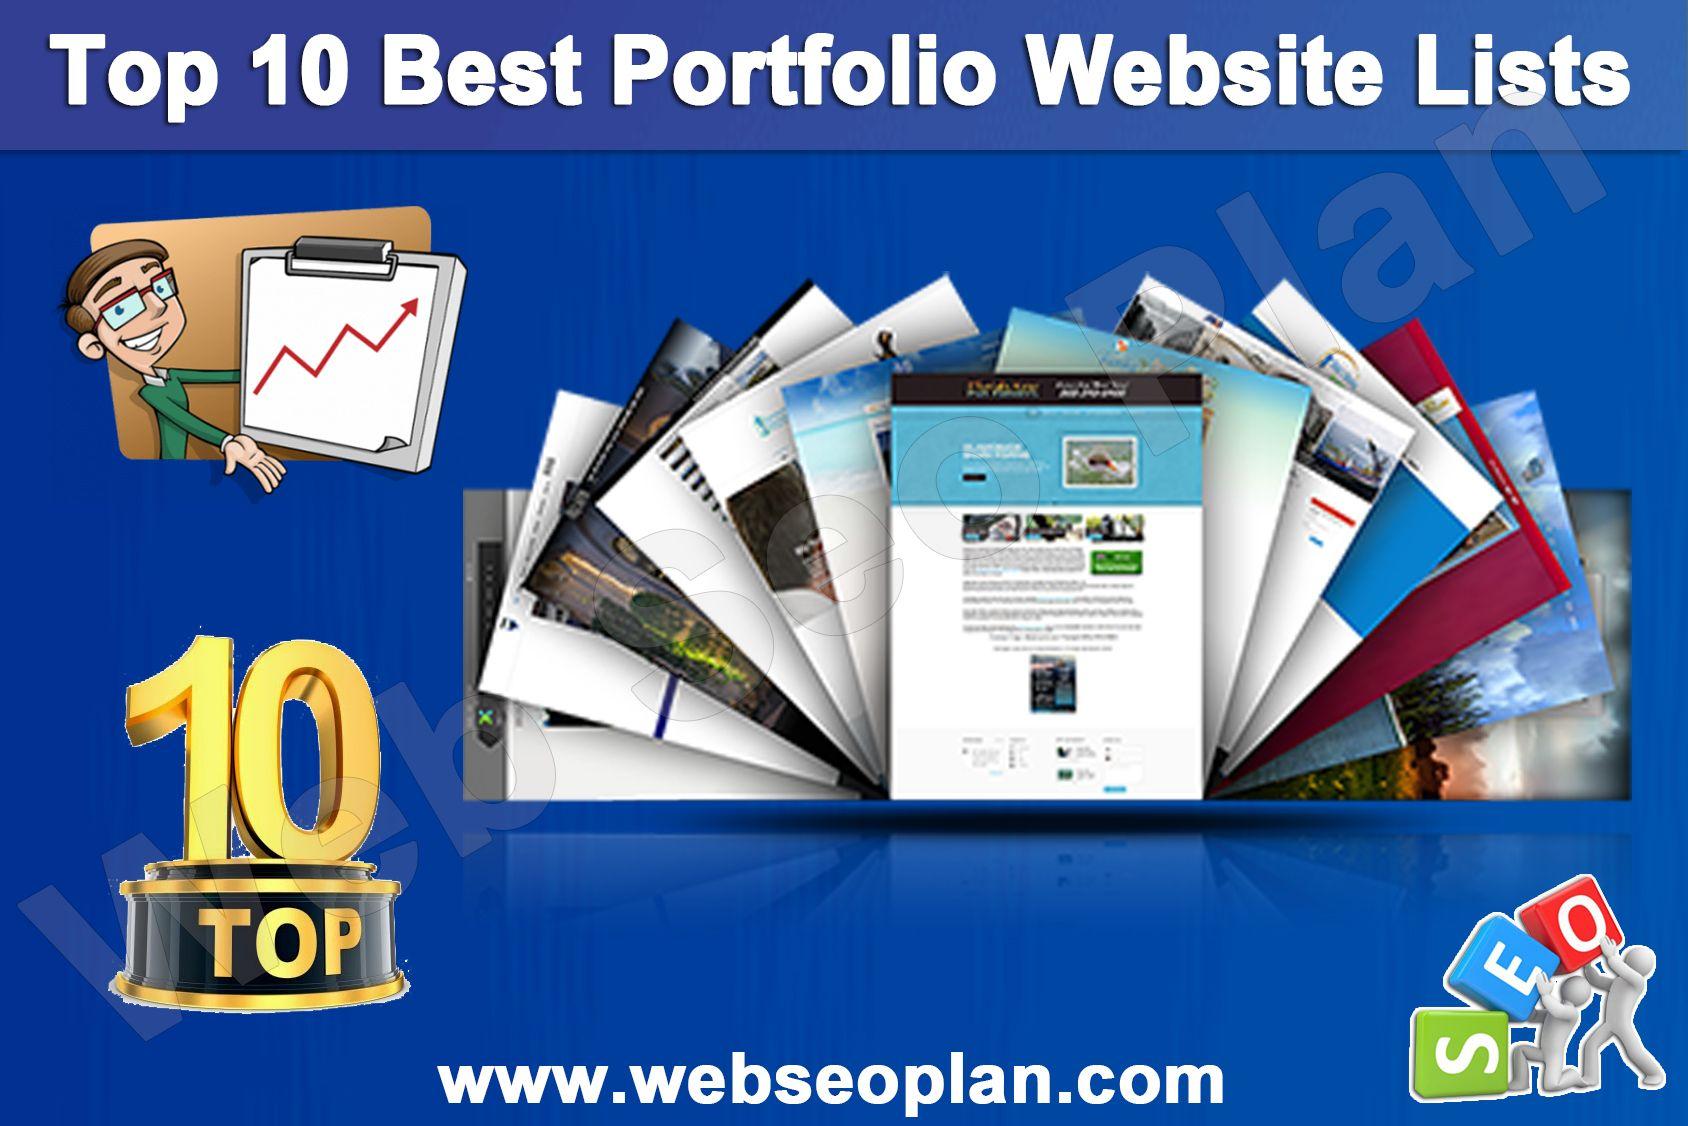 Top 10 Best Portfolio Site Lists